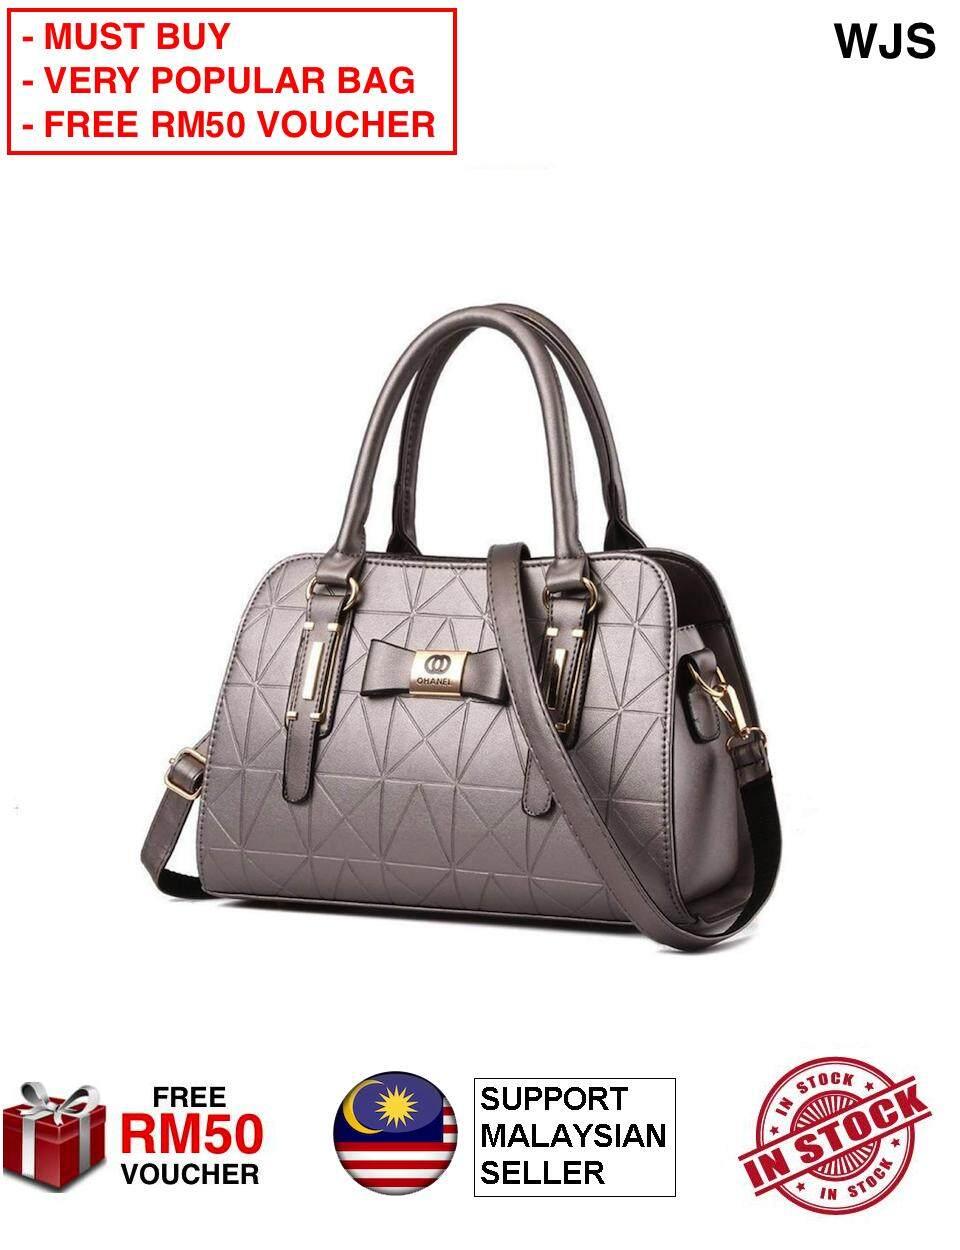 (VERY POPULAR BAG) WJS Ohanel Channel Women Handbag Premium Branded Handbag  Hand Bag Quality Fashion Handbag with Premium Material Handbeg (FREE RM50